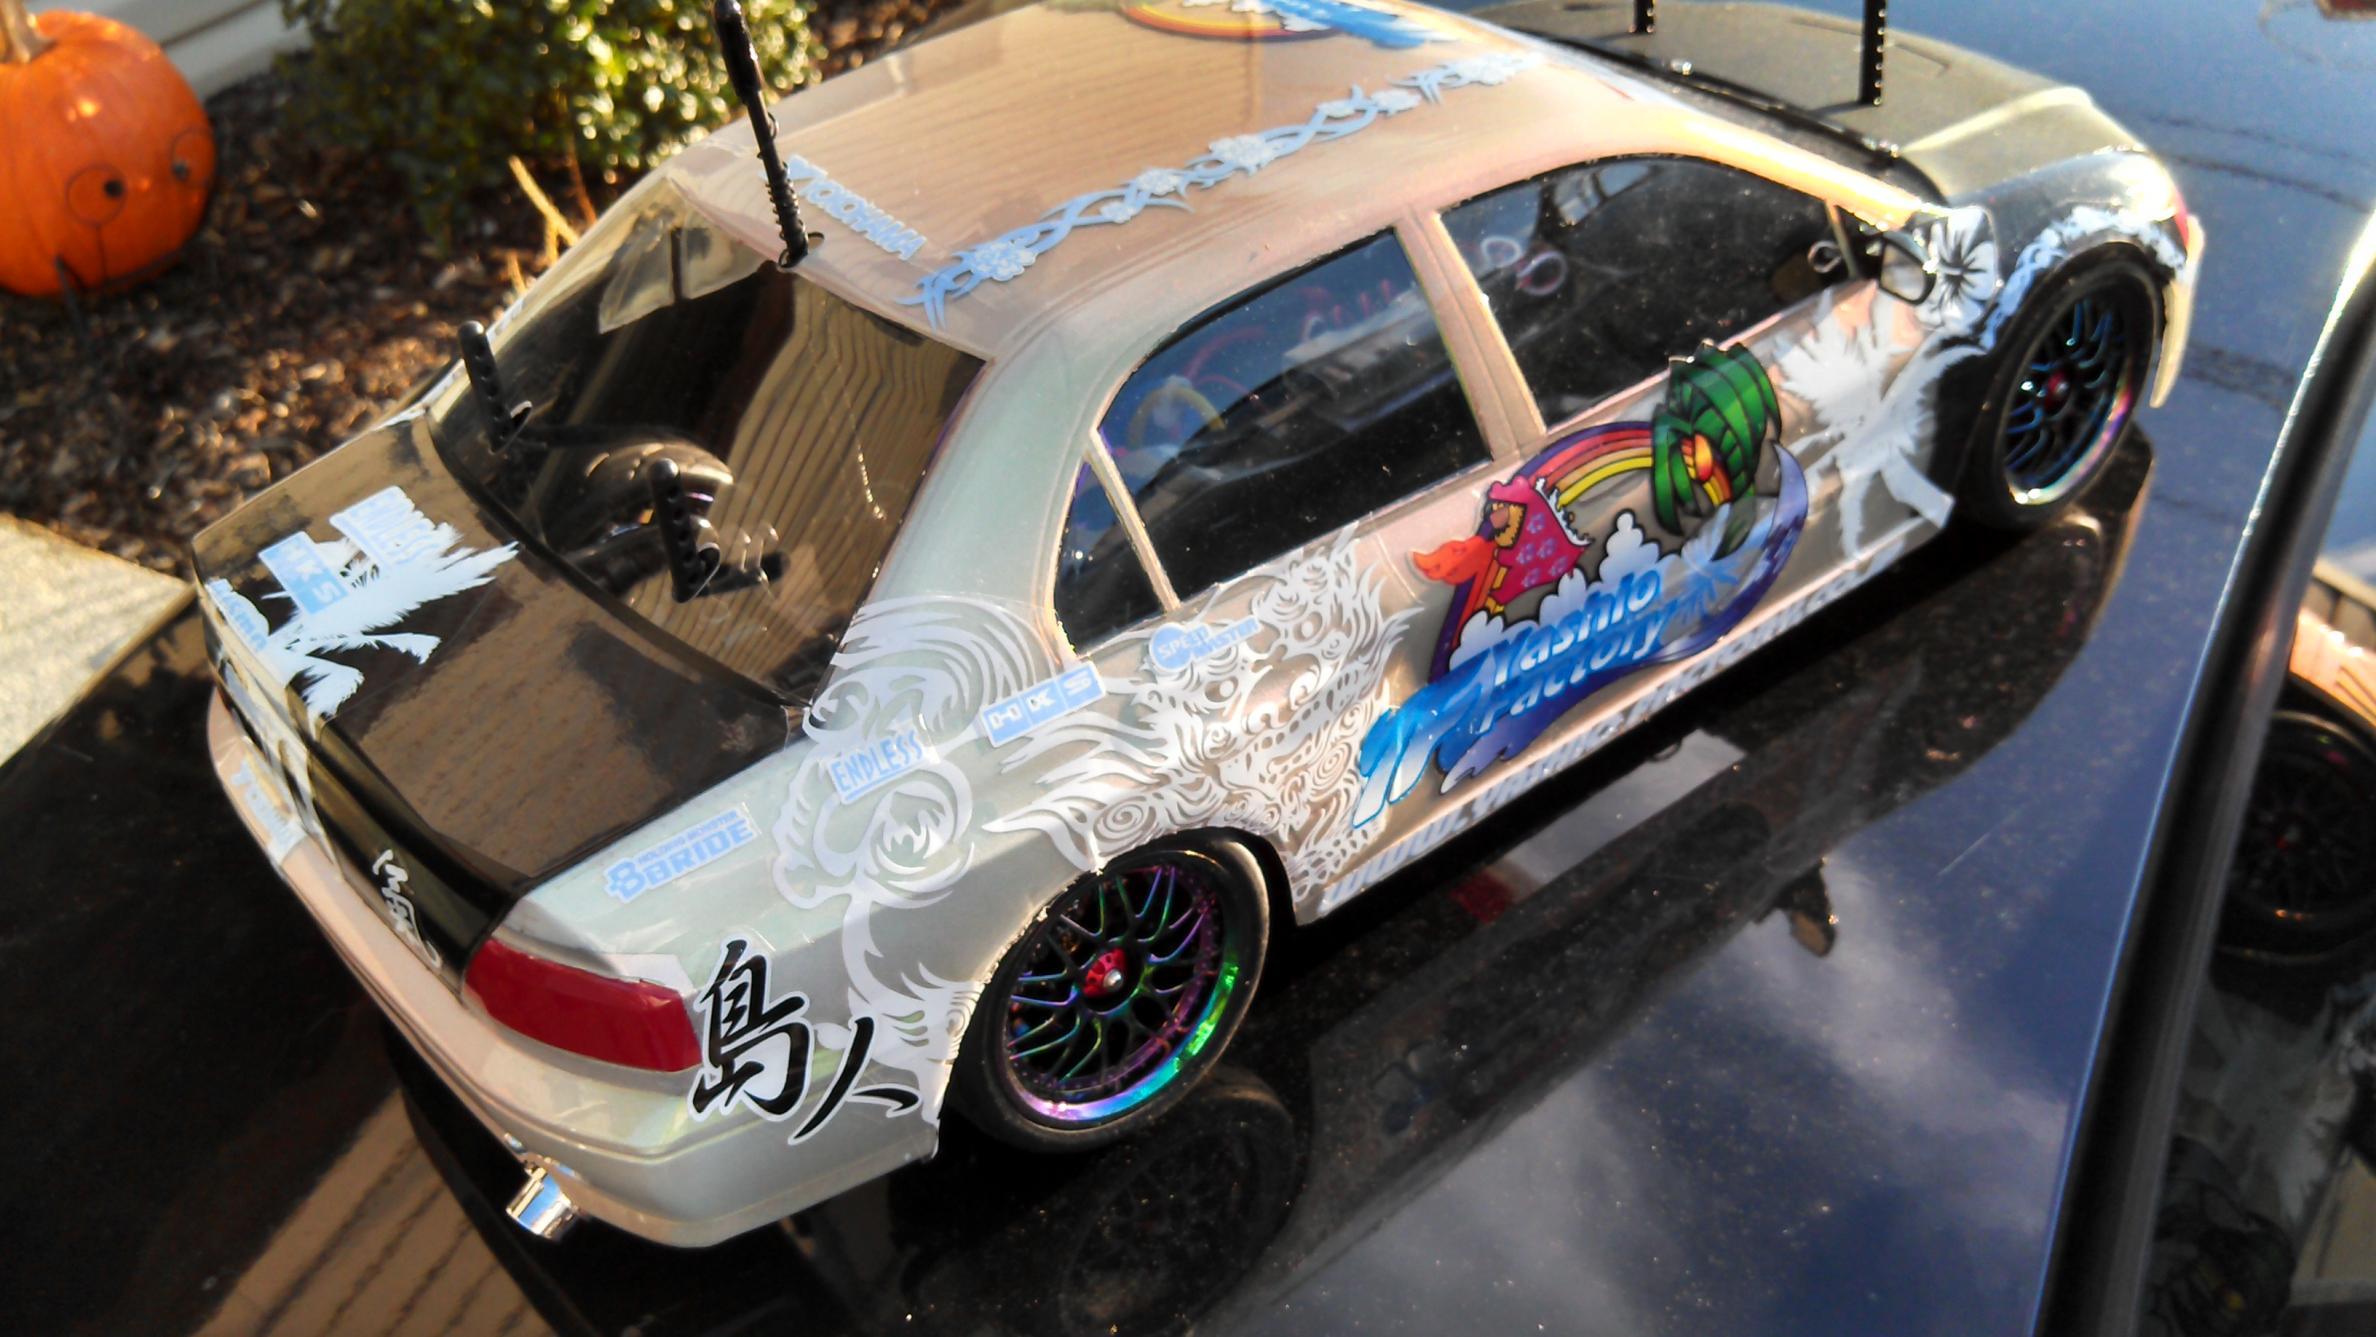 Fs Tamiya Tb 01 Evo With Yokomo Bits Drift Car Or Tc